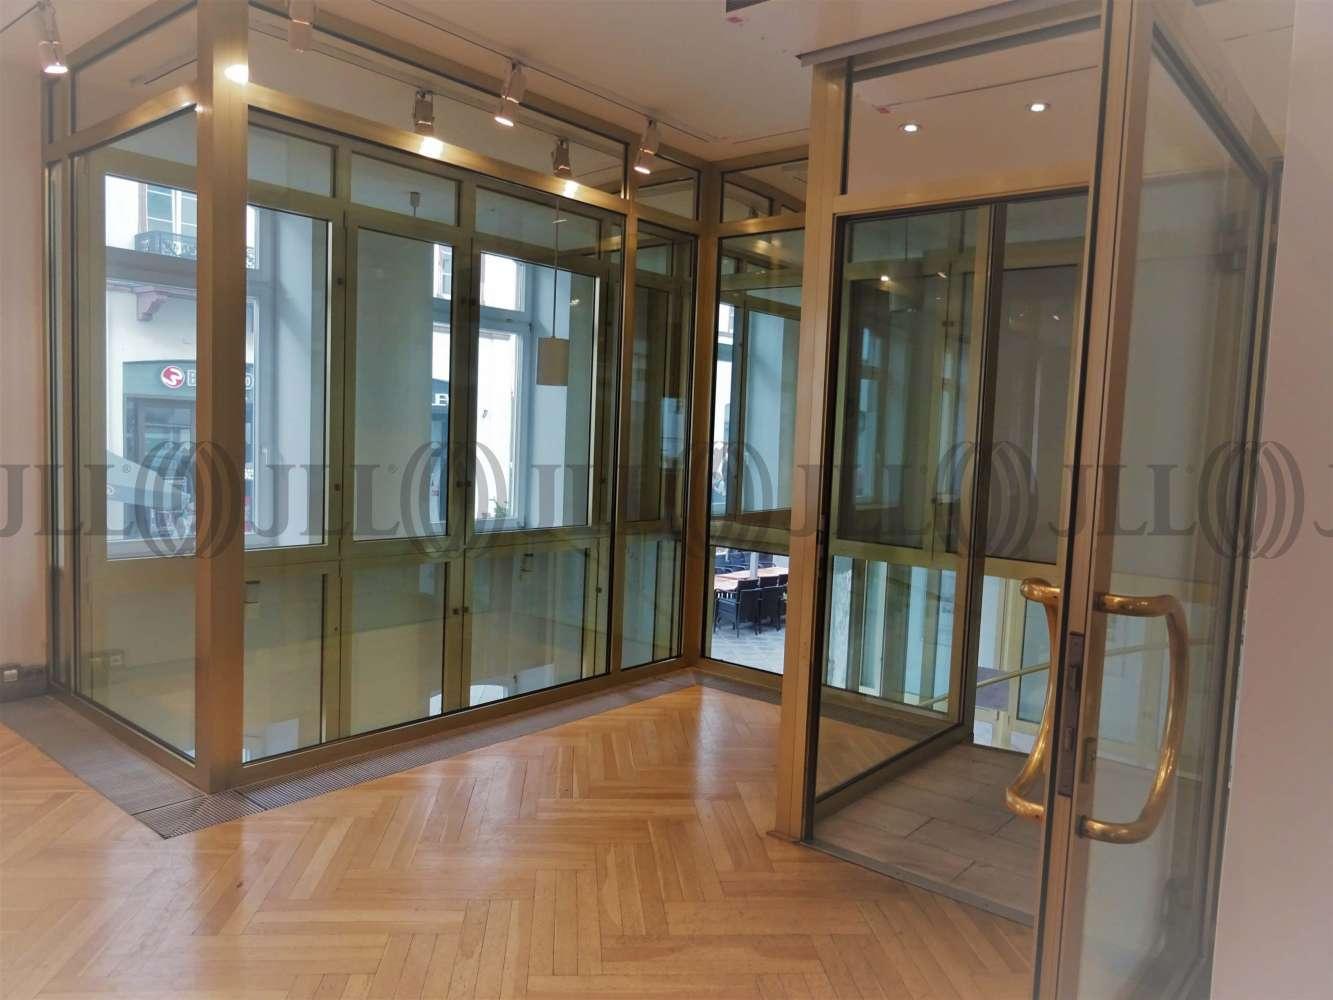 Büros Bad homburg, 61348 - Büro - Bad Homburg - F2638 - 10318940